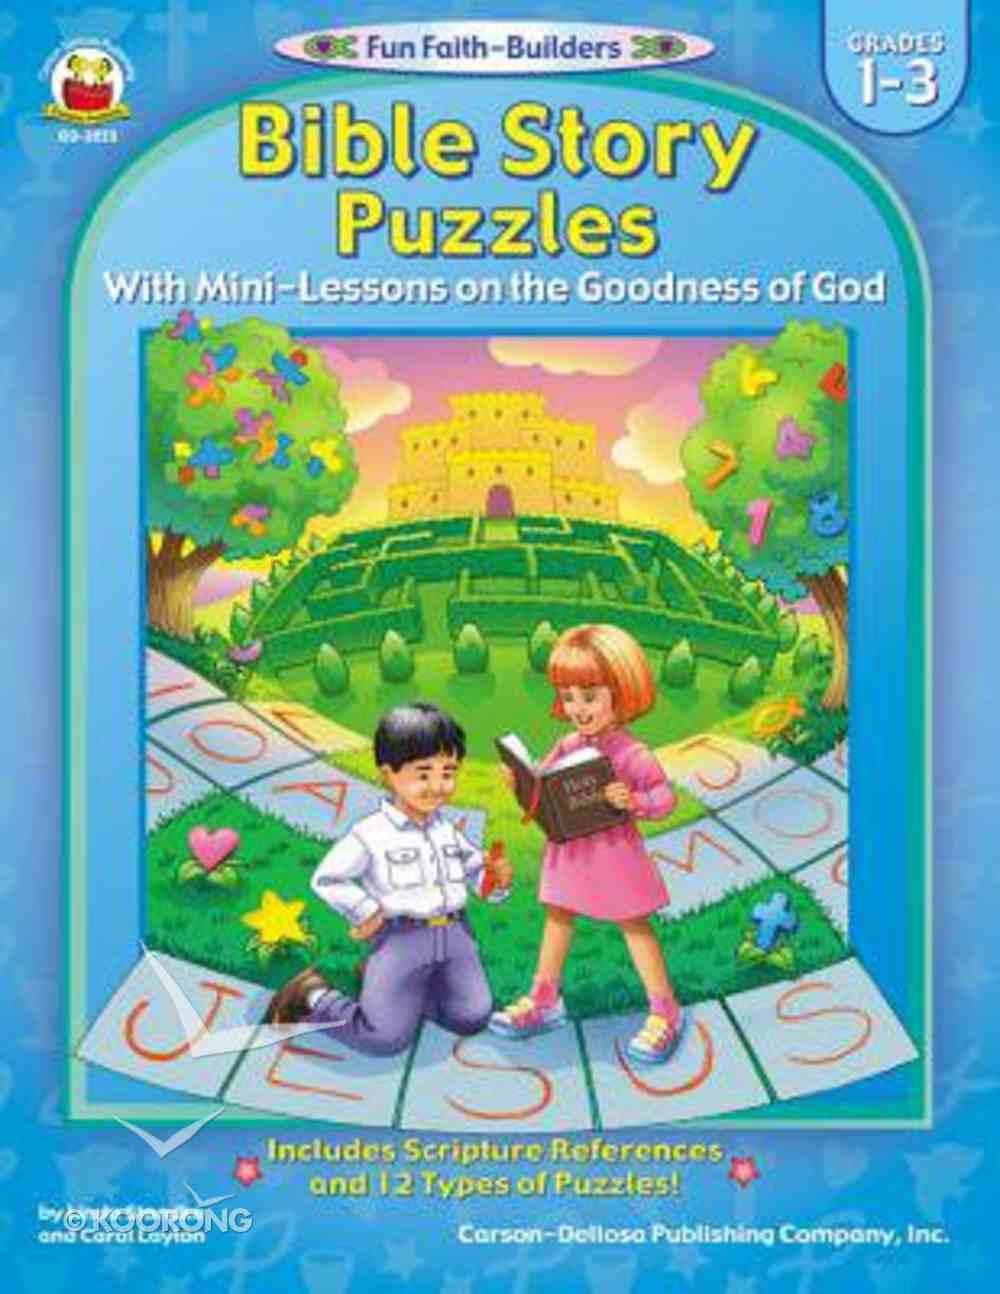 Bible Story Puzzles (Reproducible; Grades 1-3) (Fun Faith-builders Series) Paperback